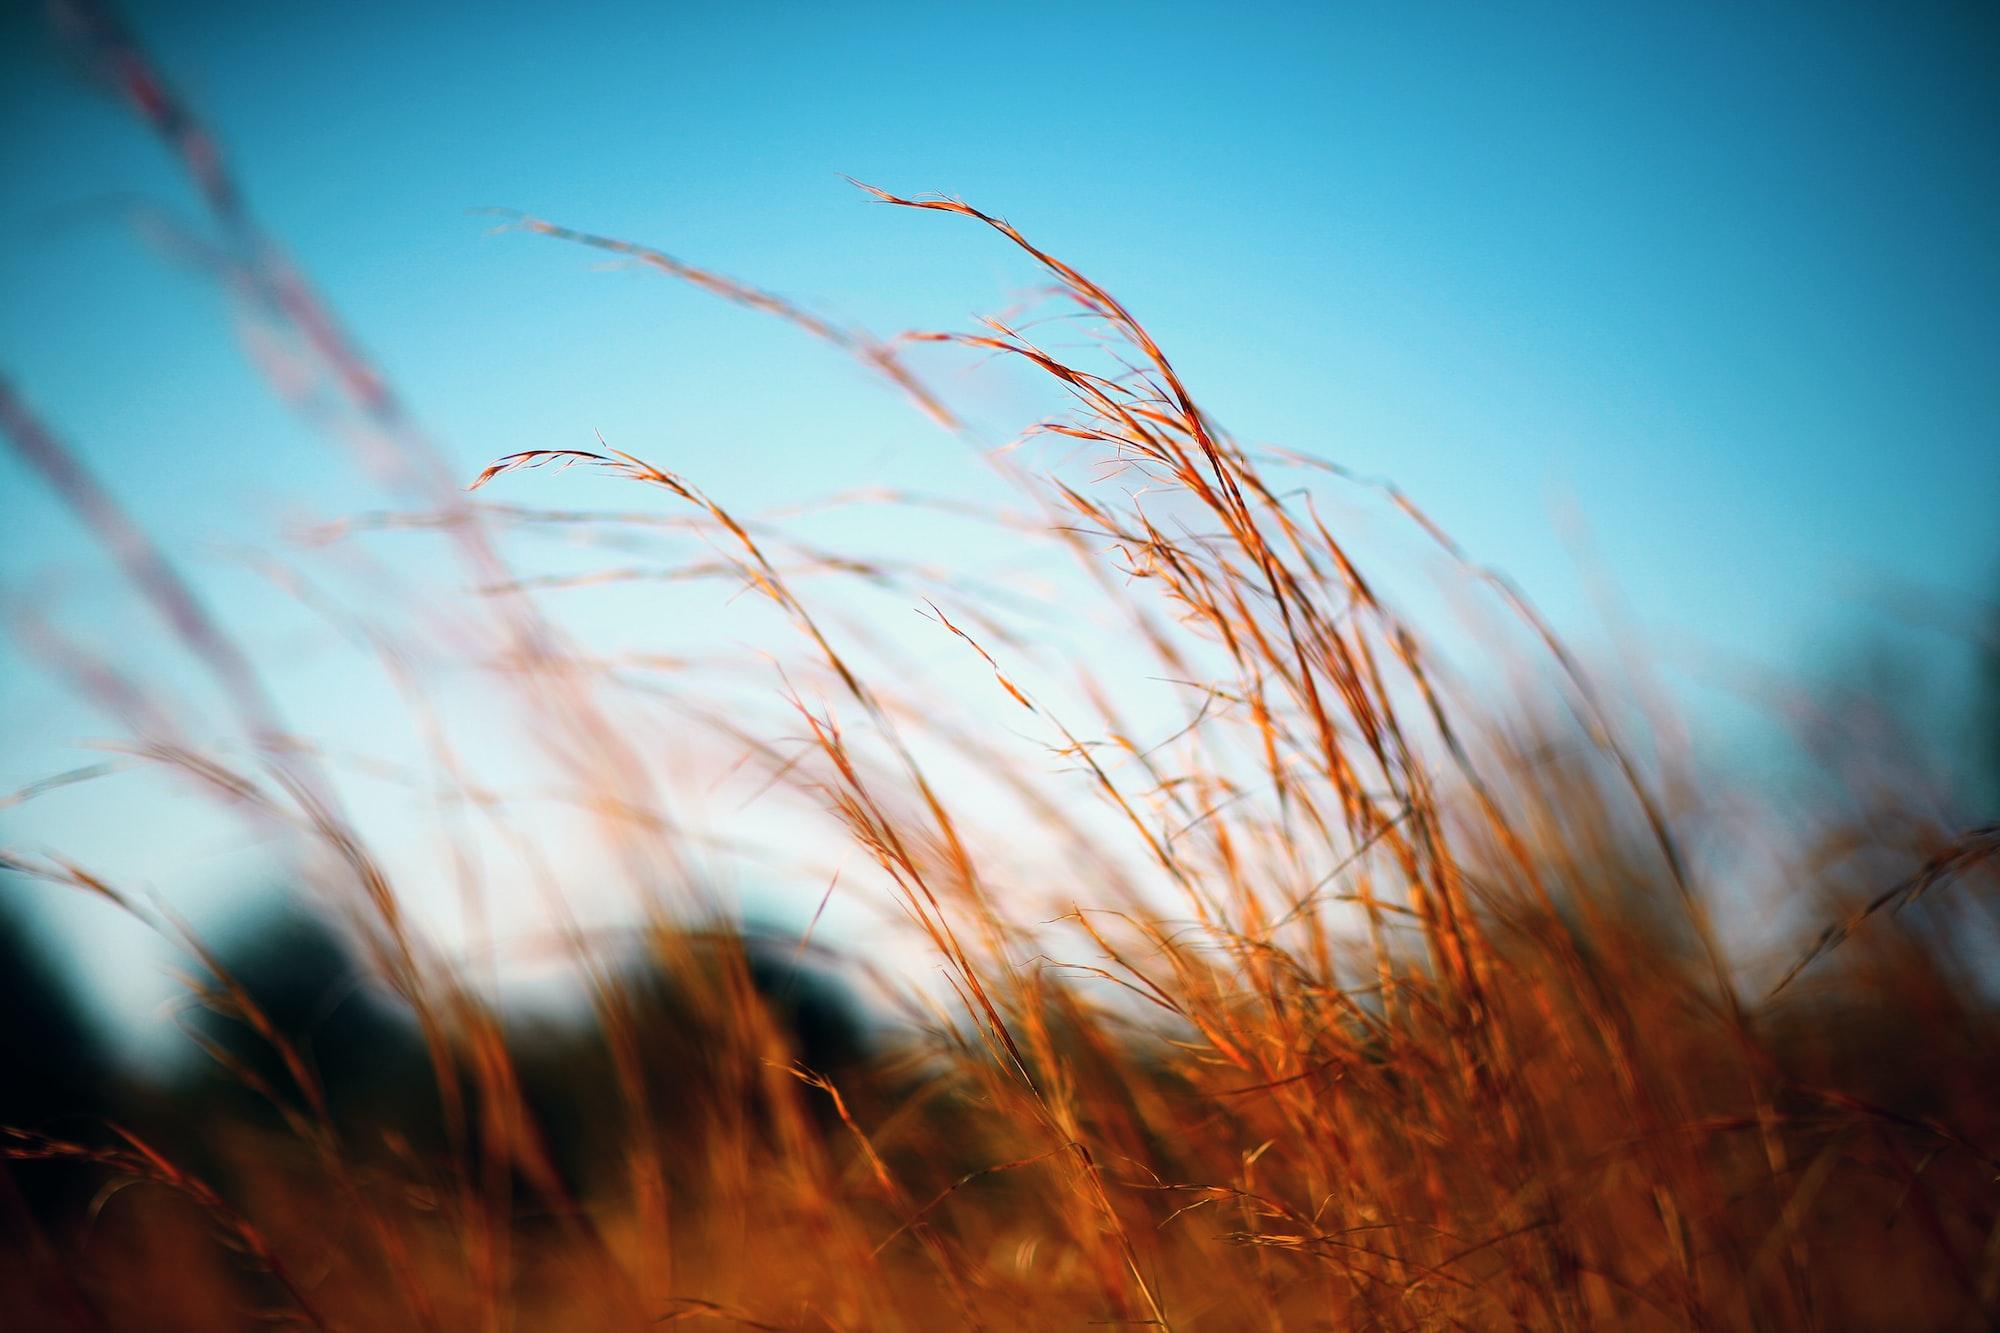 Fiery grass against a blue sky